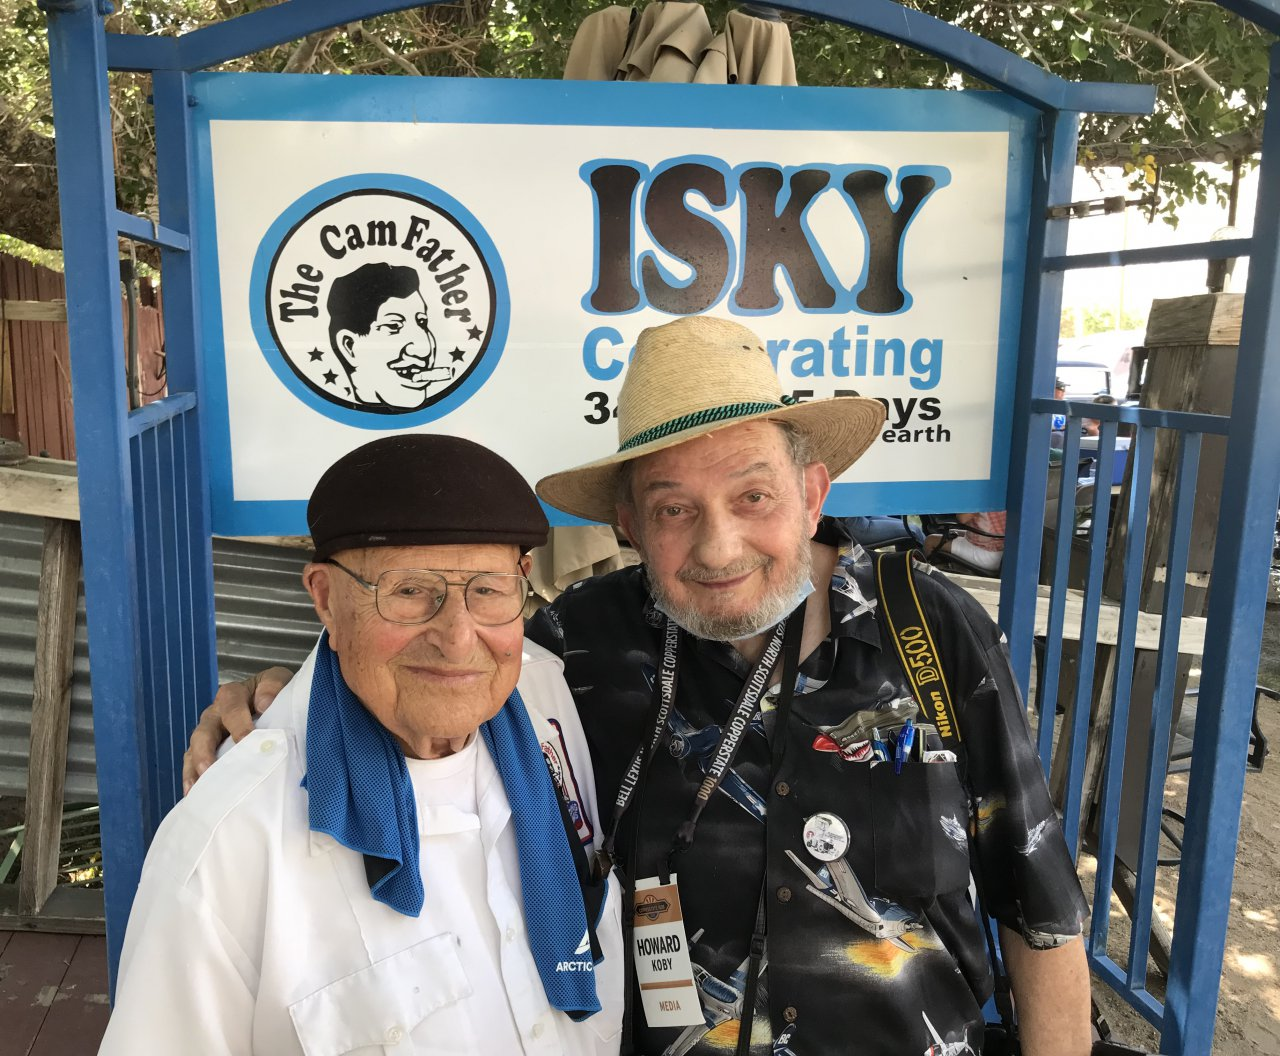 Isky, Isky still frisky at age 100, ClassicCars.com Journal